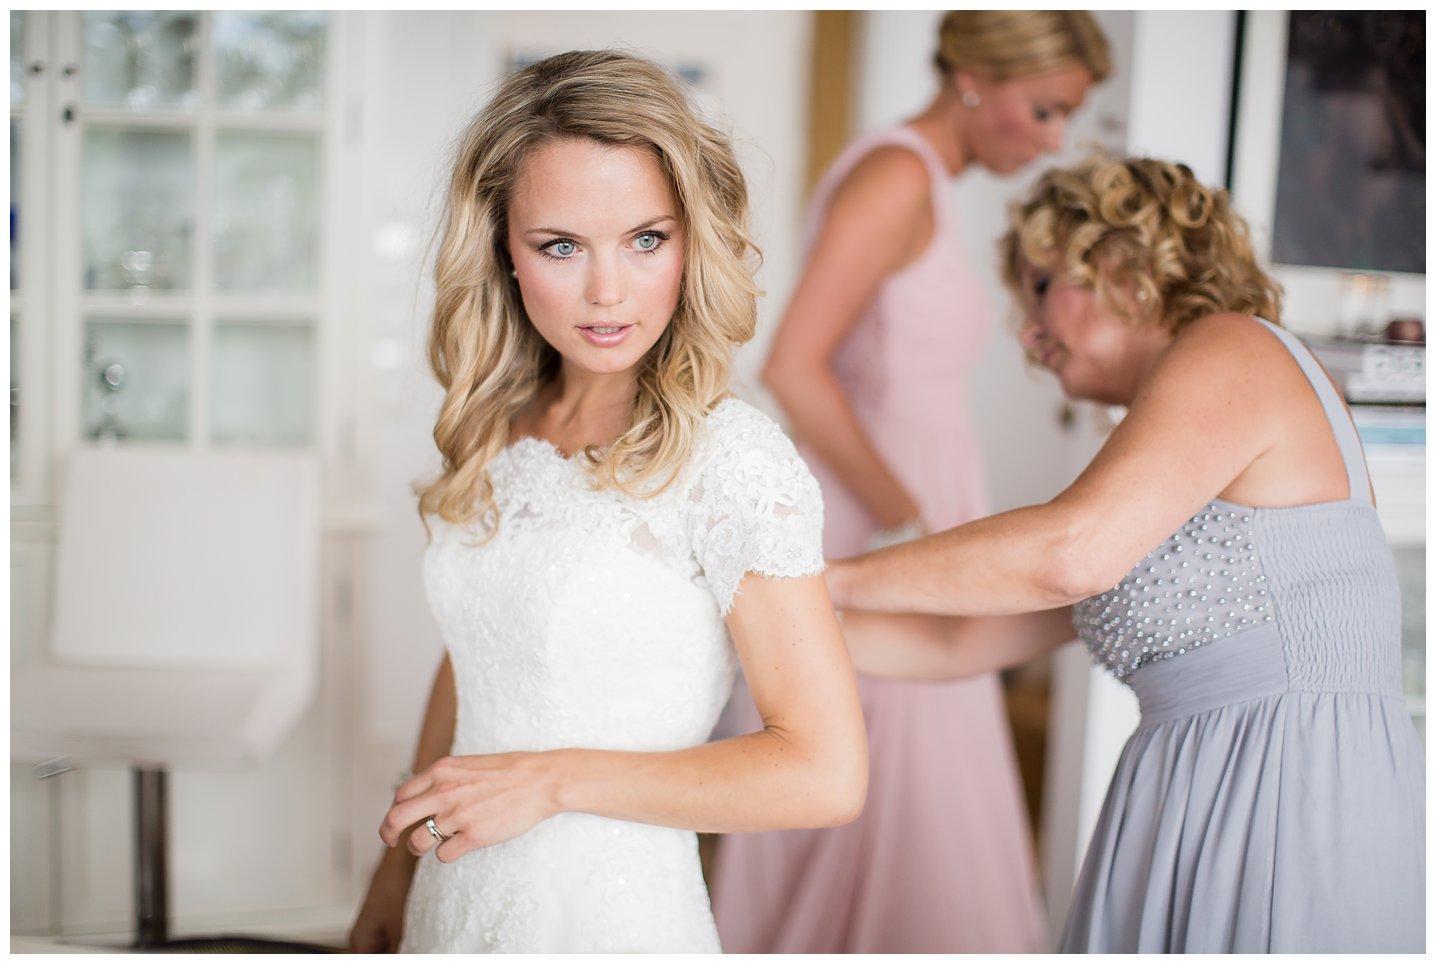 Fotograf-Eline-Jacobine-Bryllup-Villa-Malla-Camilla-og-Alexander_0029